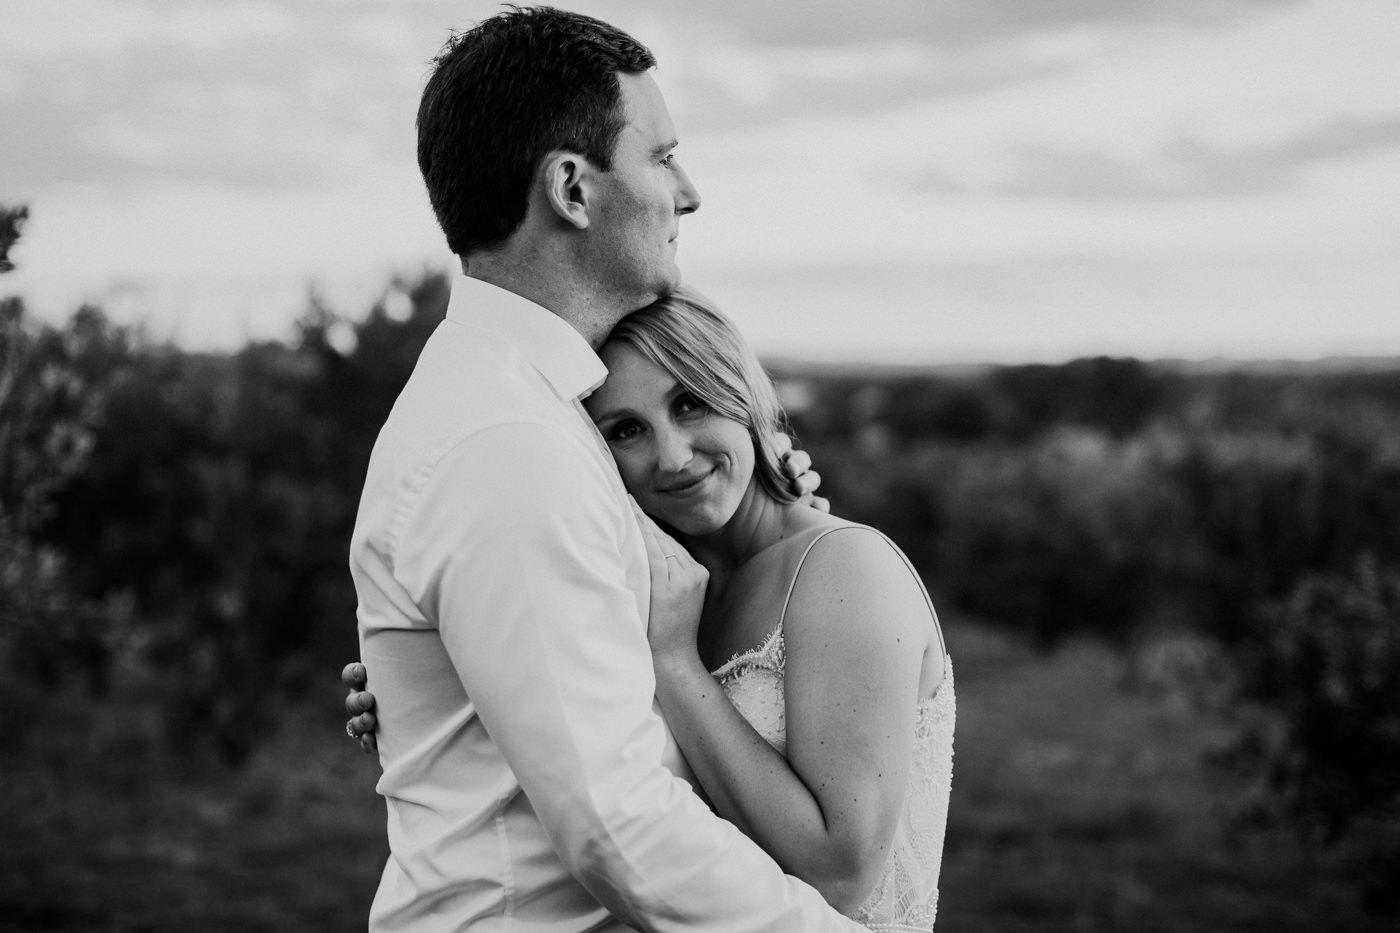 Anthony & Eliet - Wagga Wagga Wedding - Country NSW - Samantha Heather Photography-166.jpg